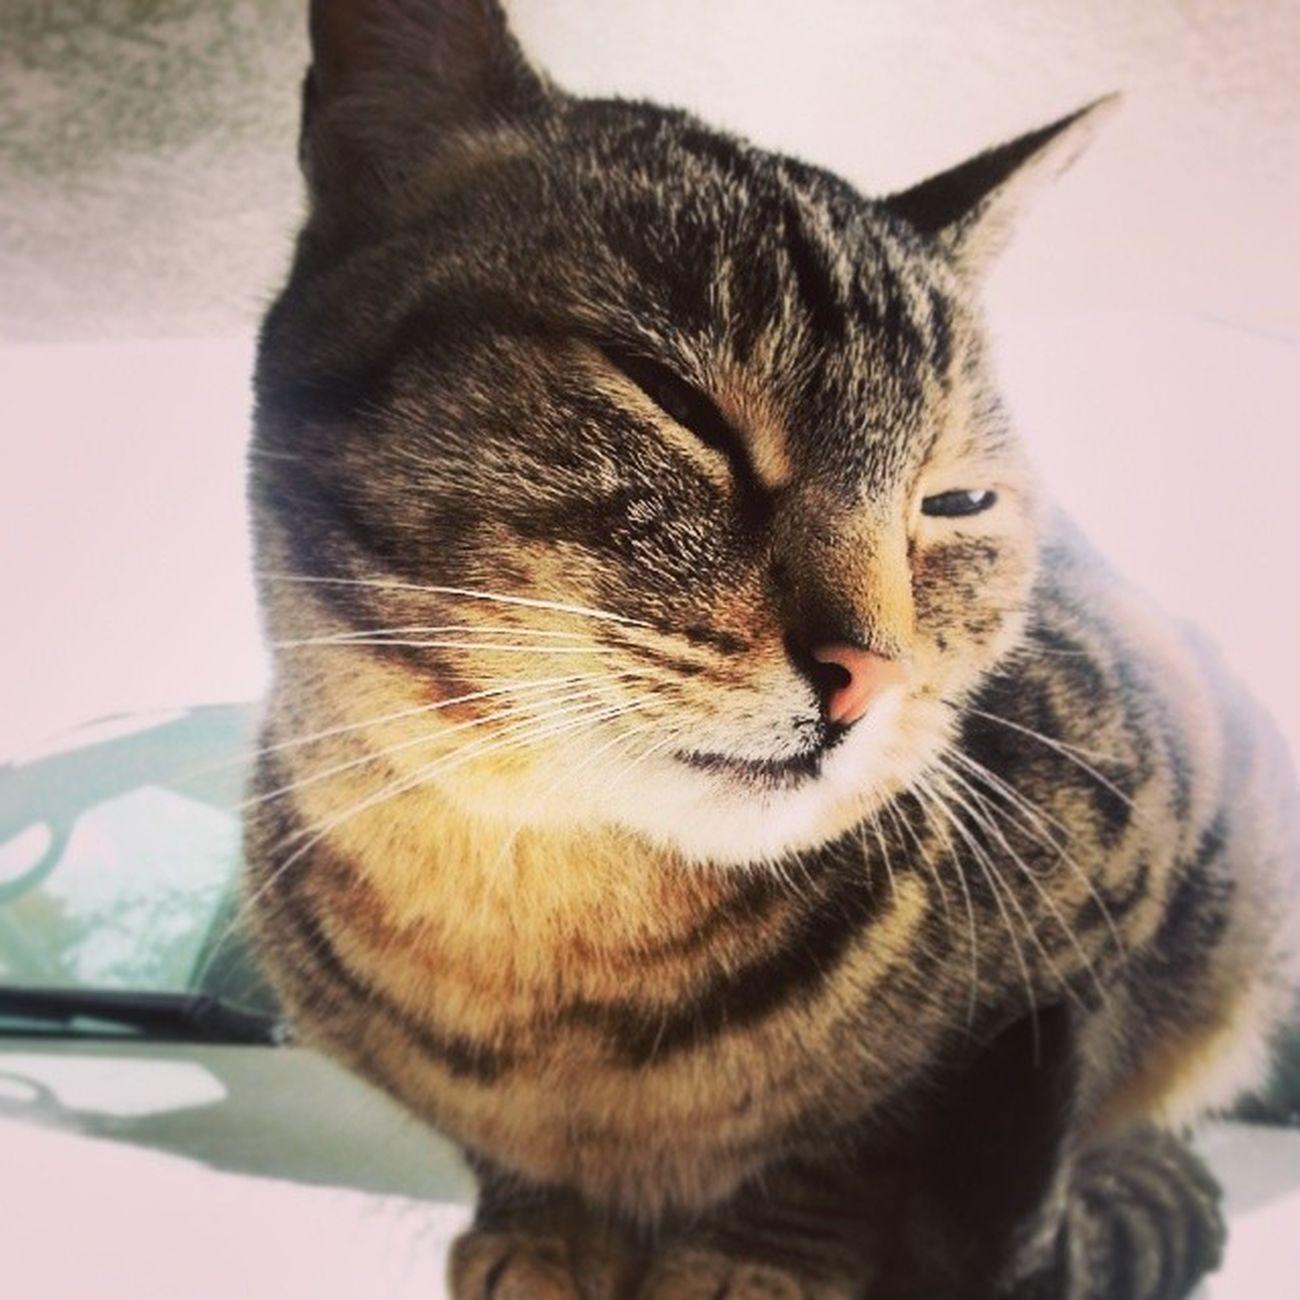 Loves when Sleepy visits. Notmycat Neighborscat Meow Catsofinstagram